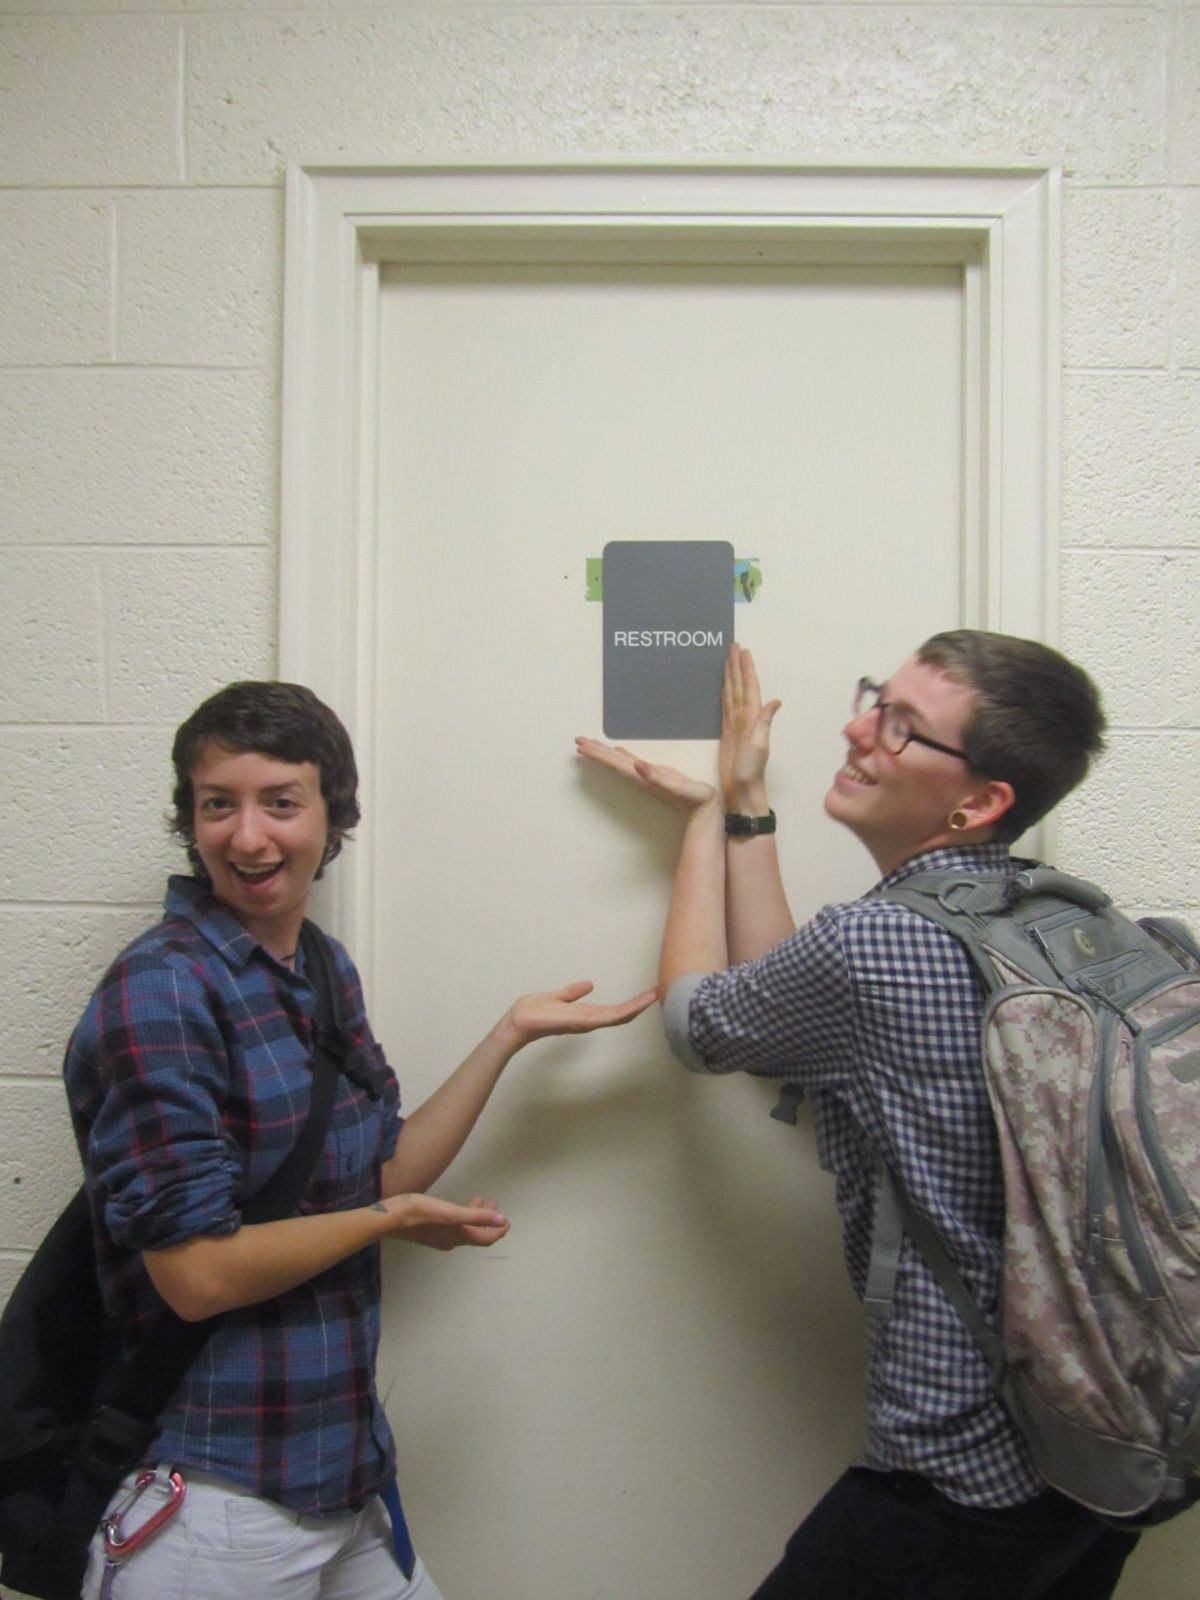 Bathroom Door Gender Google Search Genderfree Pee Pots - All gender bathroom sign for bathroom decor ideas